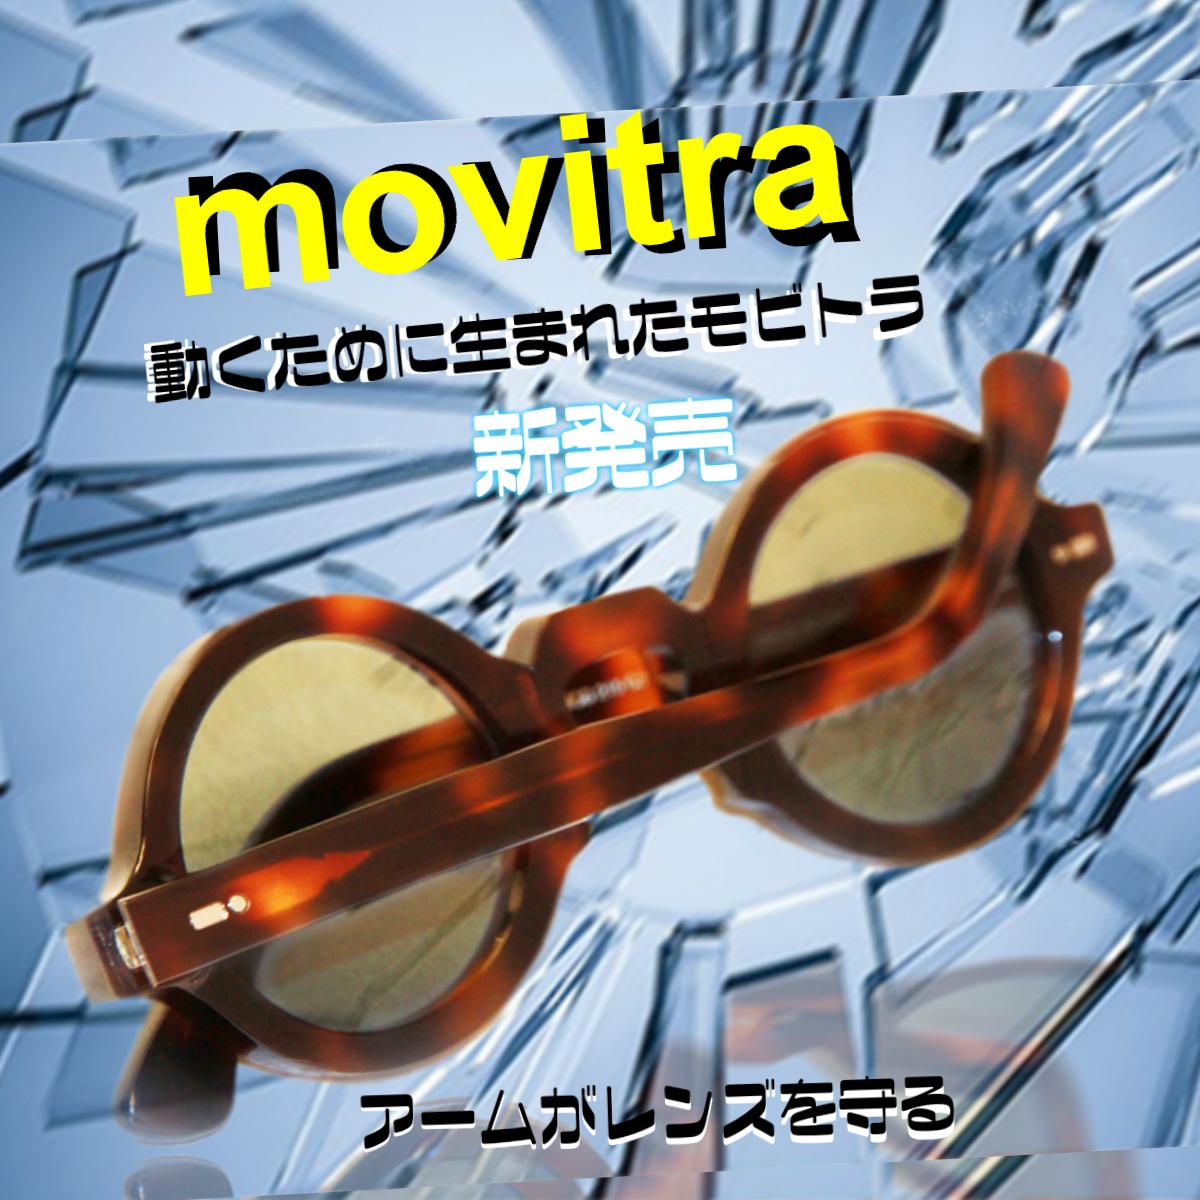 MOVITRA Sunglasses [215C3L2CAT2] DARK HAVANA GREEN LENSES モビトラ サングラス べっ甲柄 グリーンレンズ 緑色のレンズ ラウンド形 丸形 ロイドメガネ UVカット メンズサングラス レディースサングラス